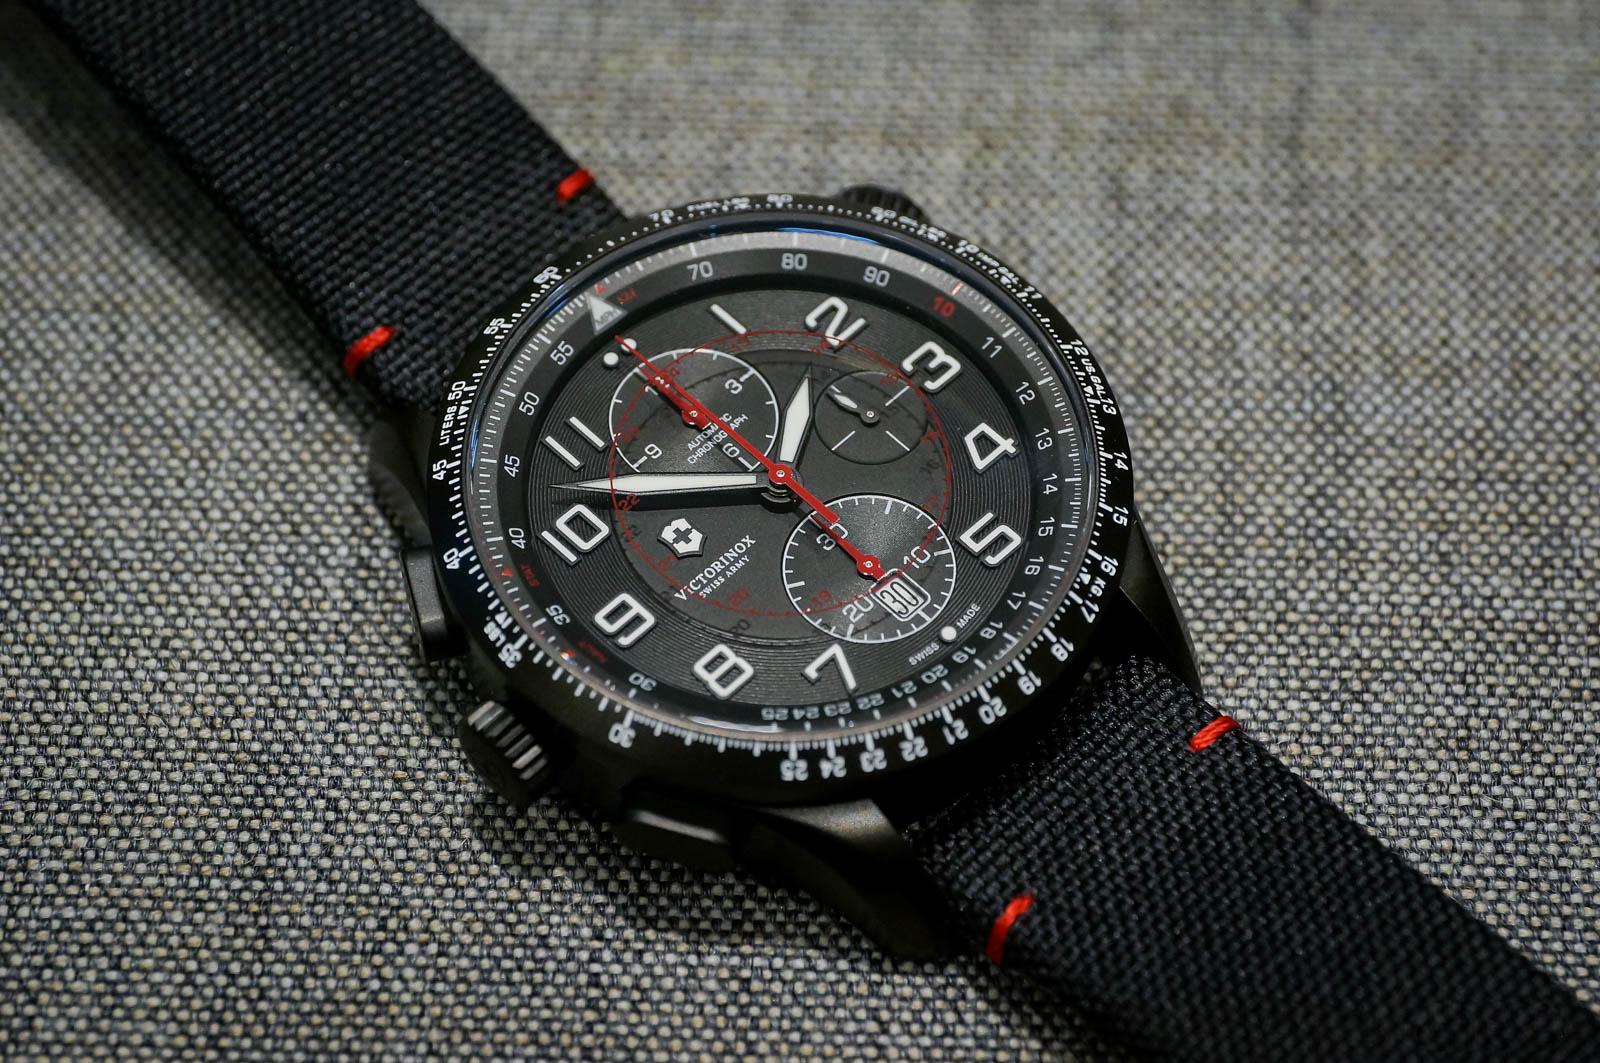 Victorinox Airboss Mach 9 Black Edition Watch Review